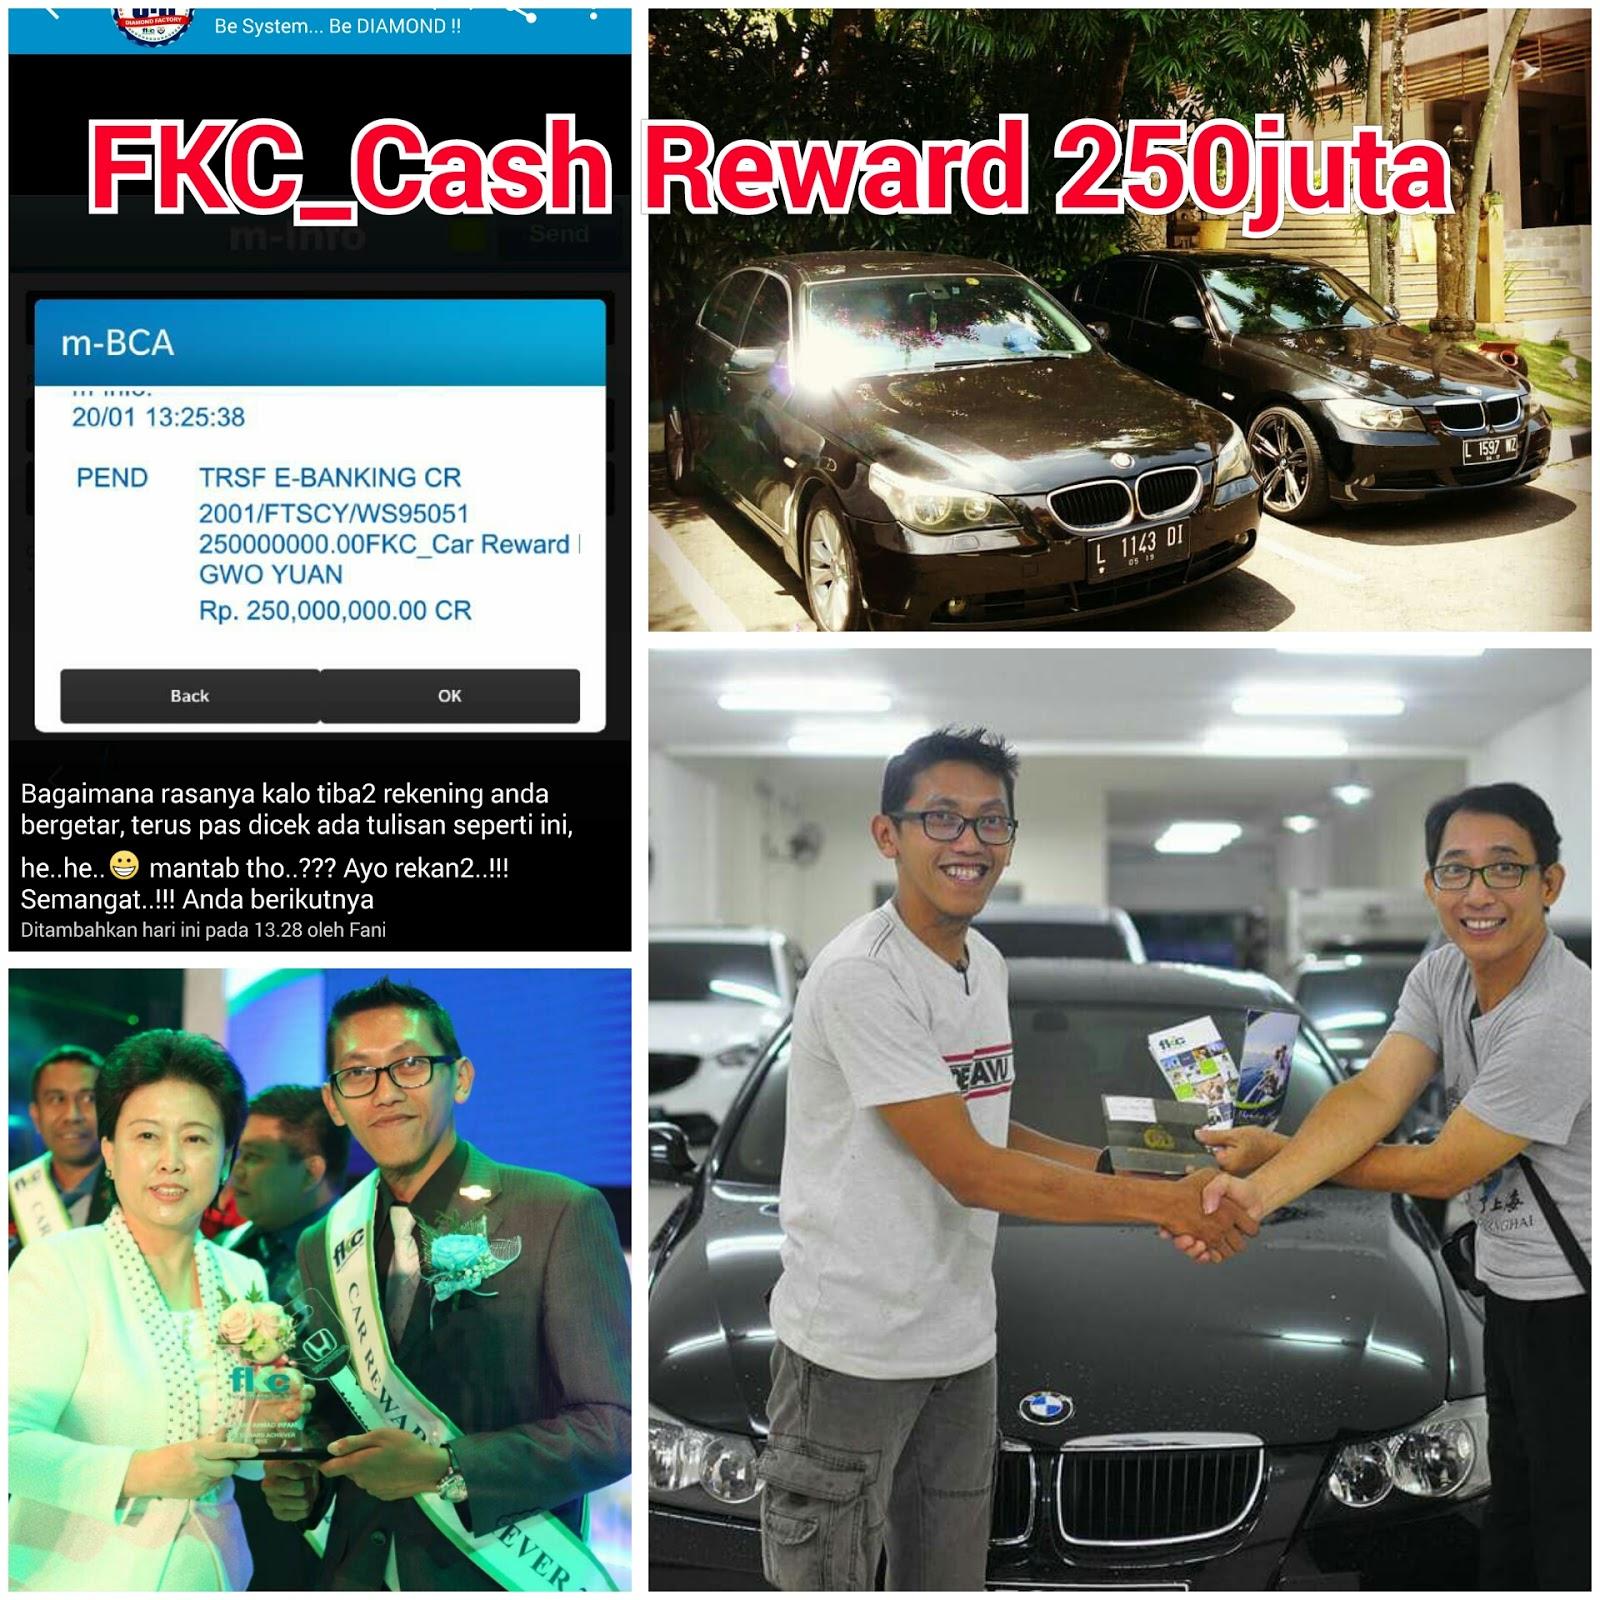 Bisnis Fkc Syariah - Reward Wildhan Ahmad Irfani